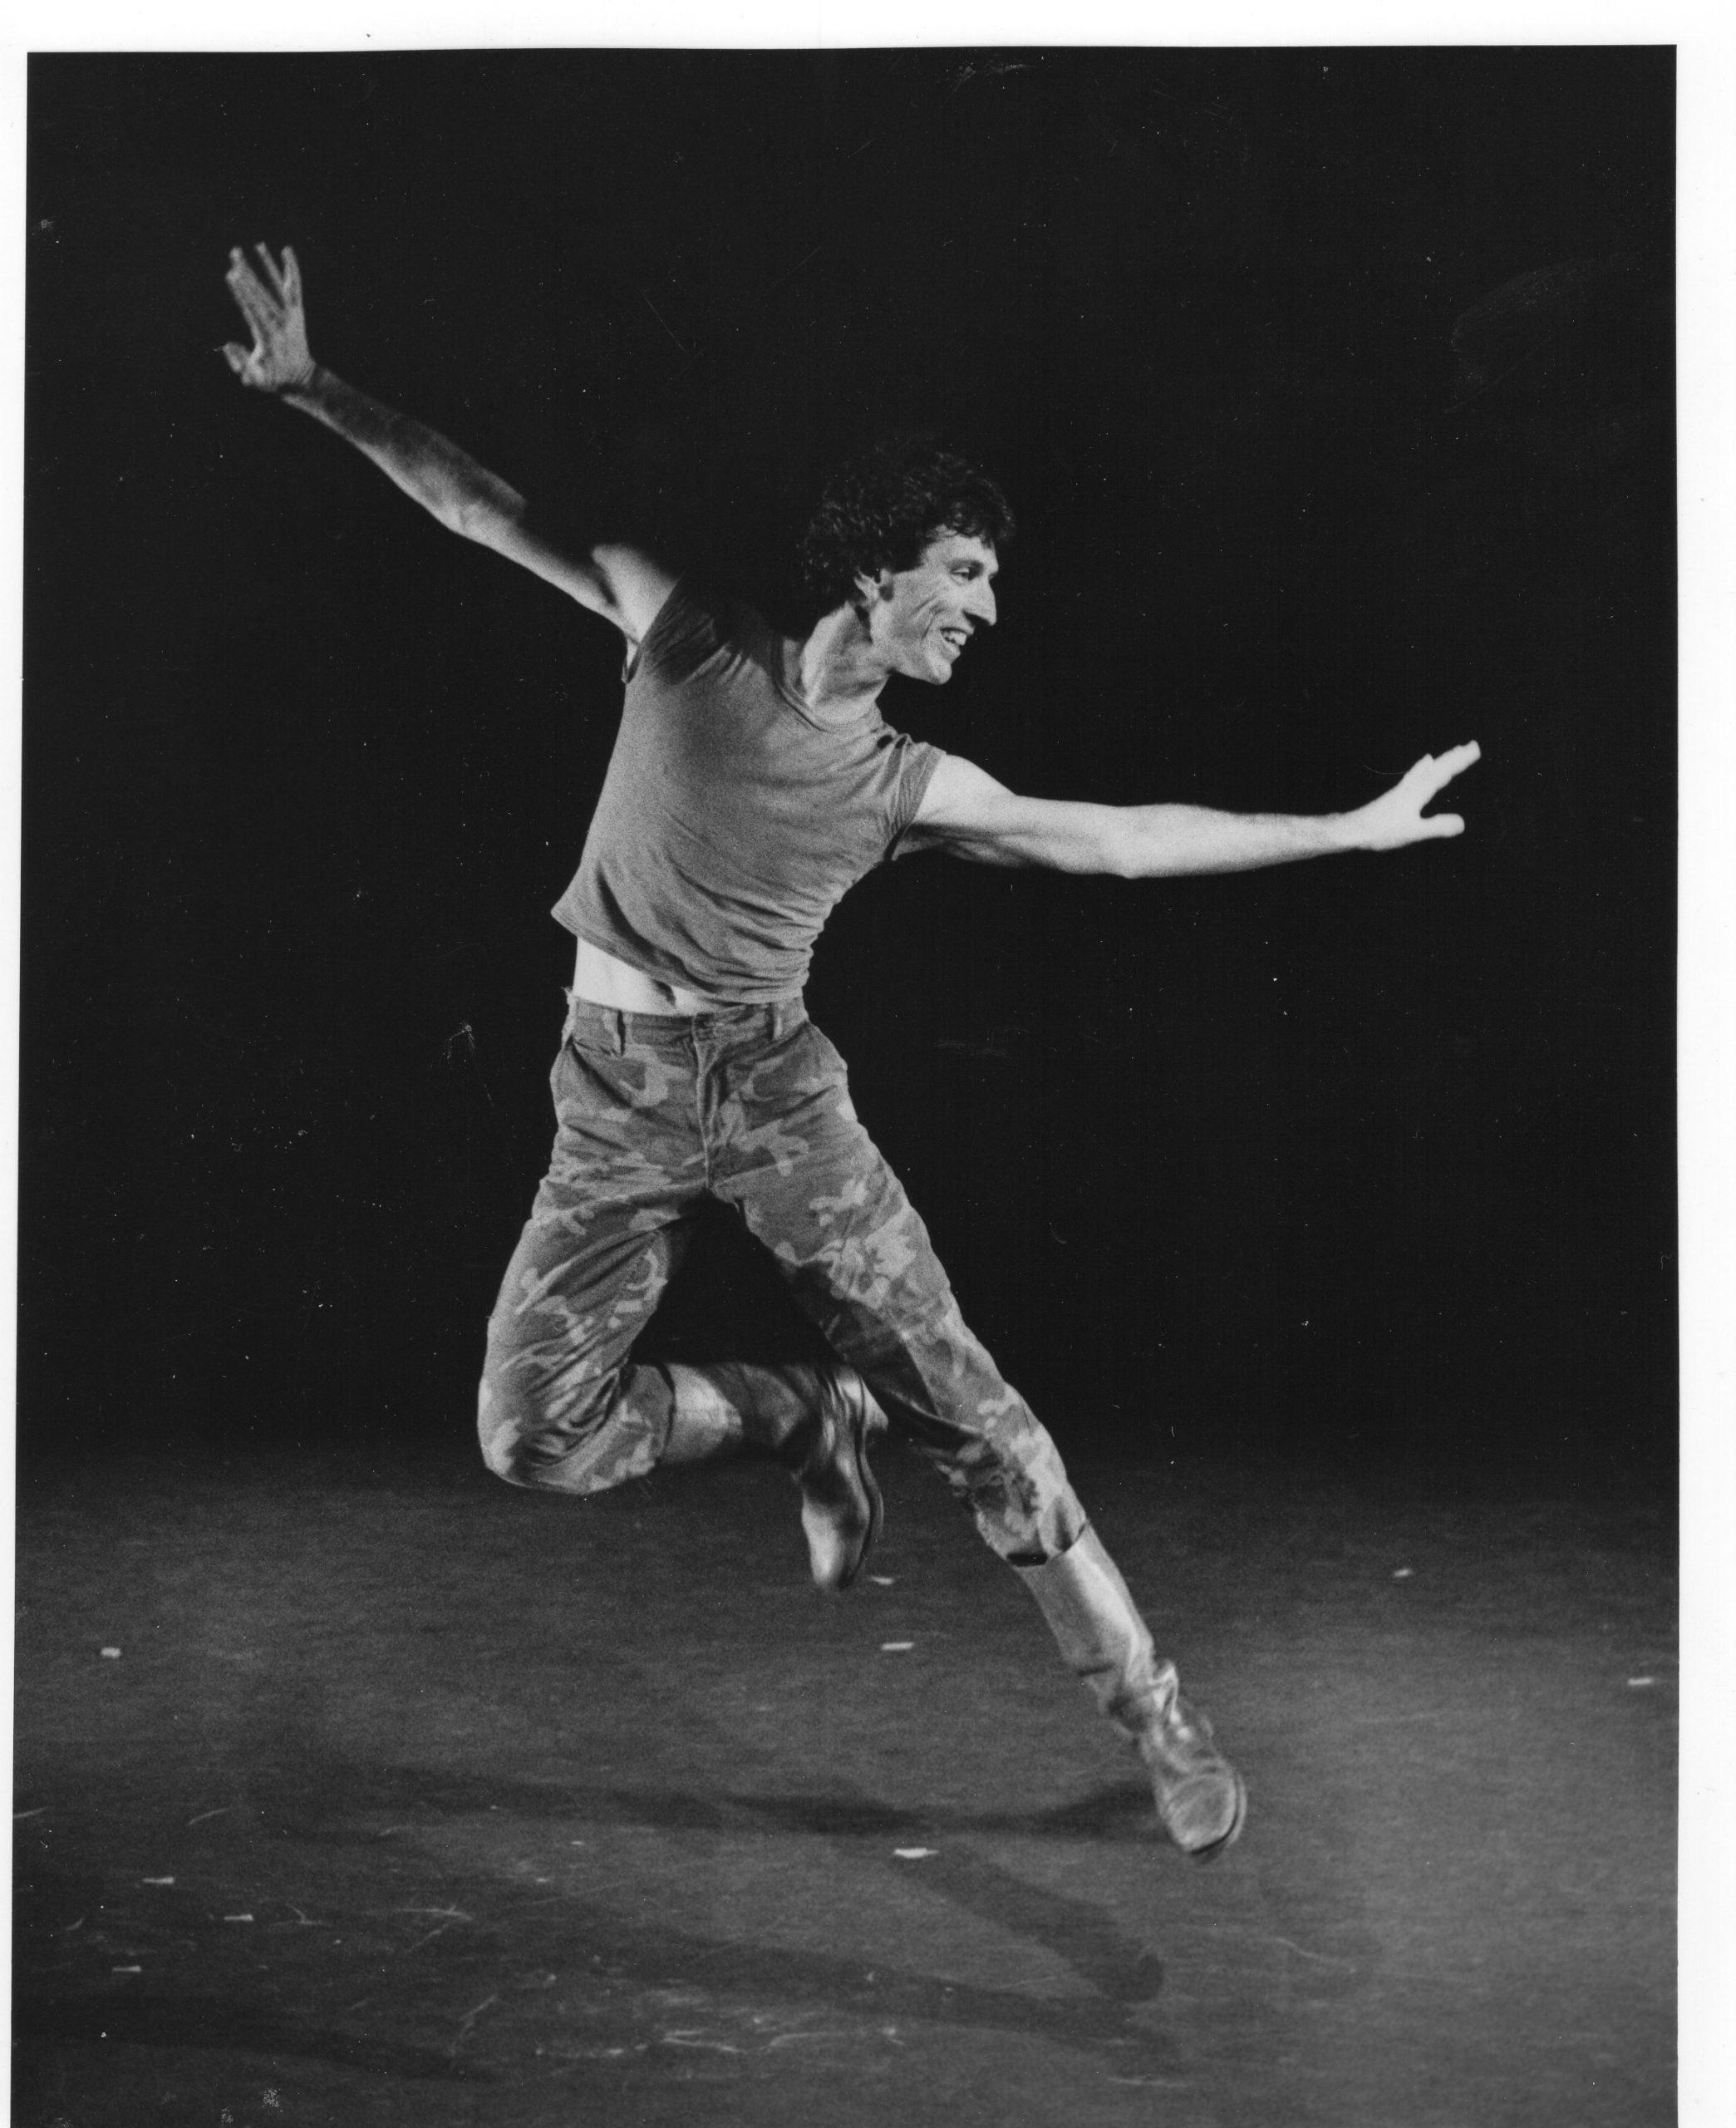 Michael Kelly Bruce dance photo